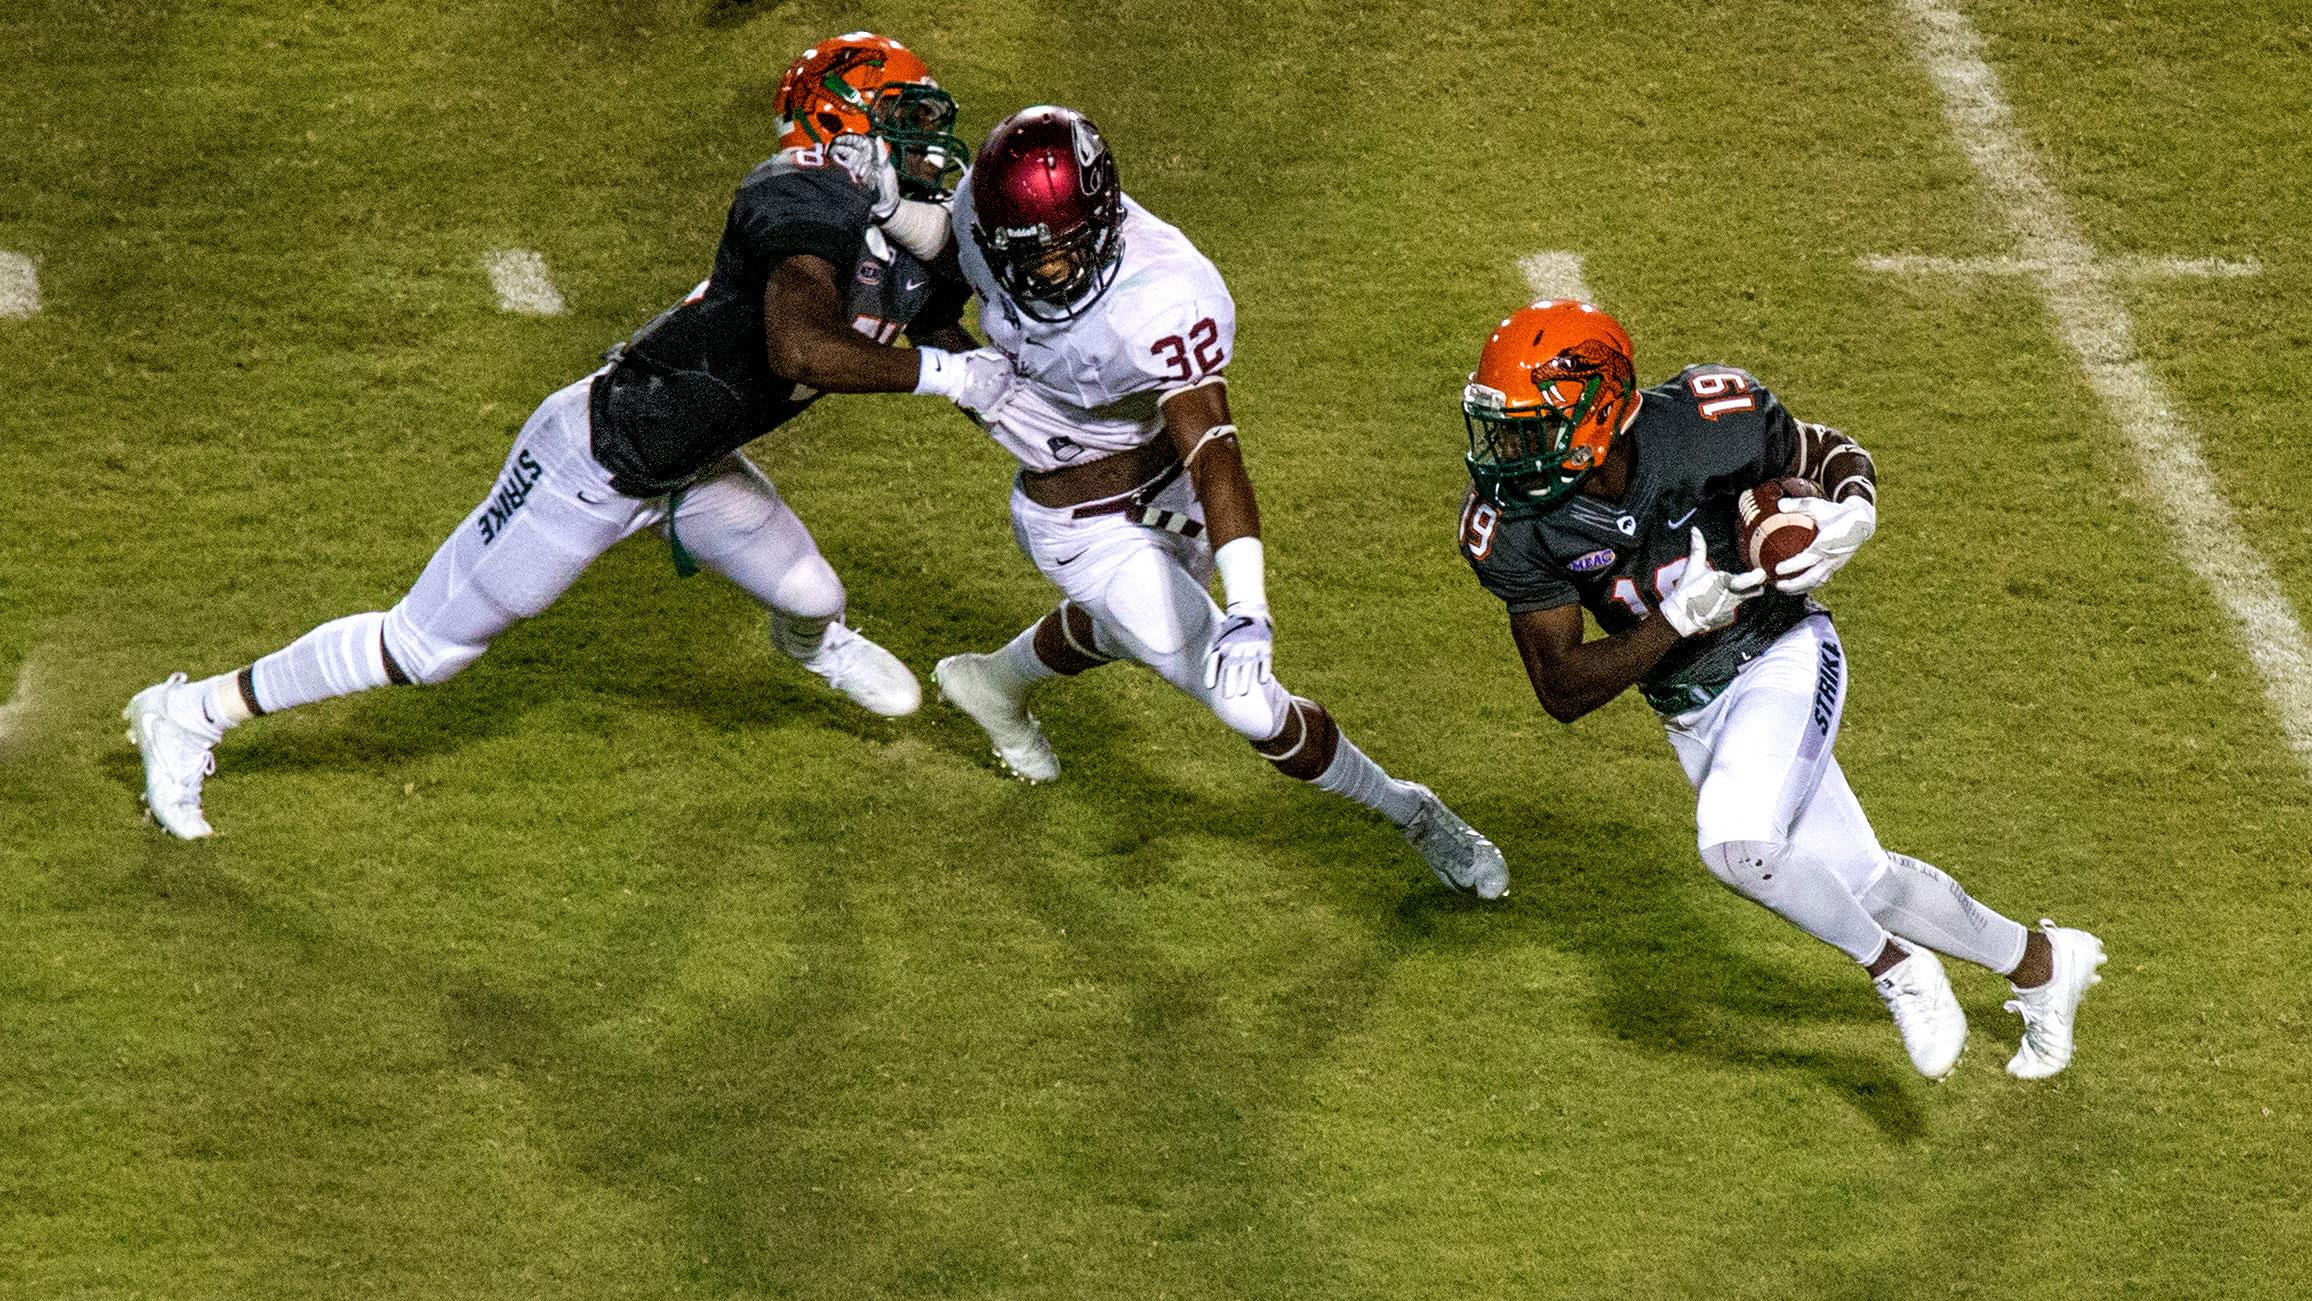 Florida A&M plays North Carolina Central in NCAA football